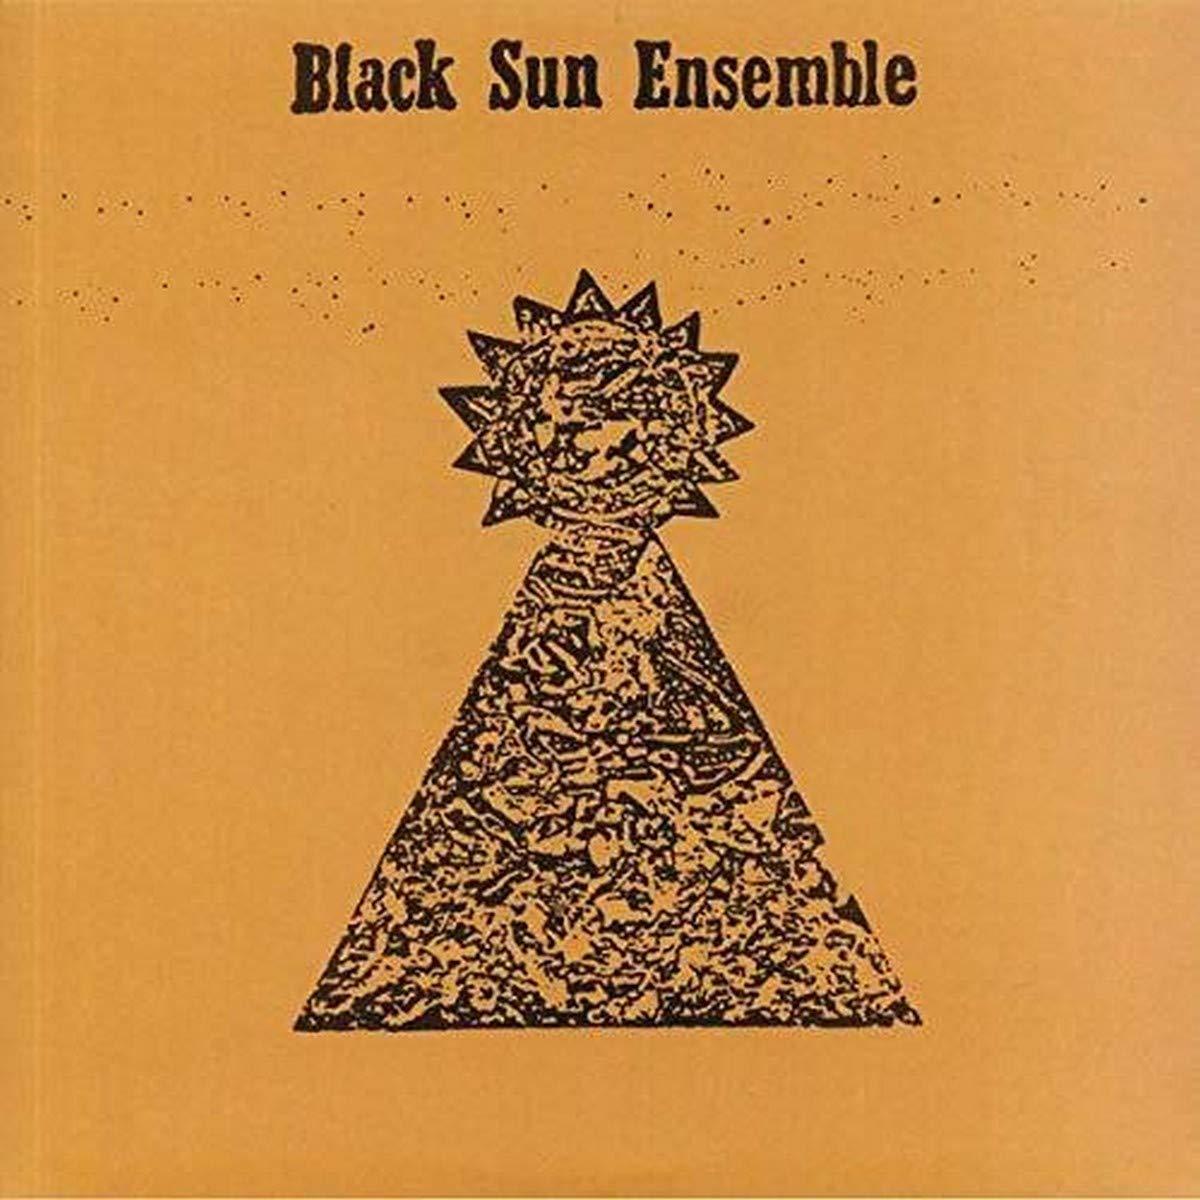 Black Sun Ensemble - Raga Del Sol [LP]